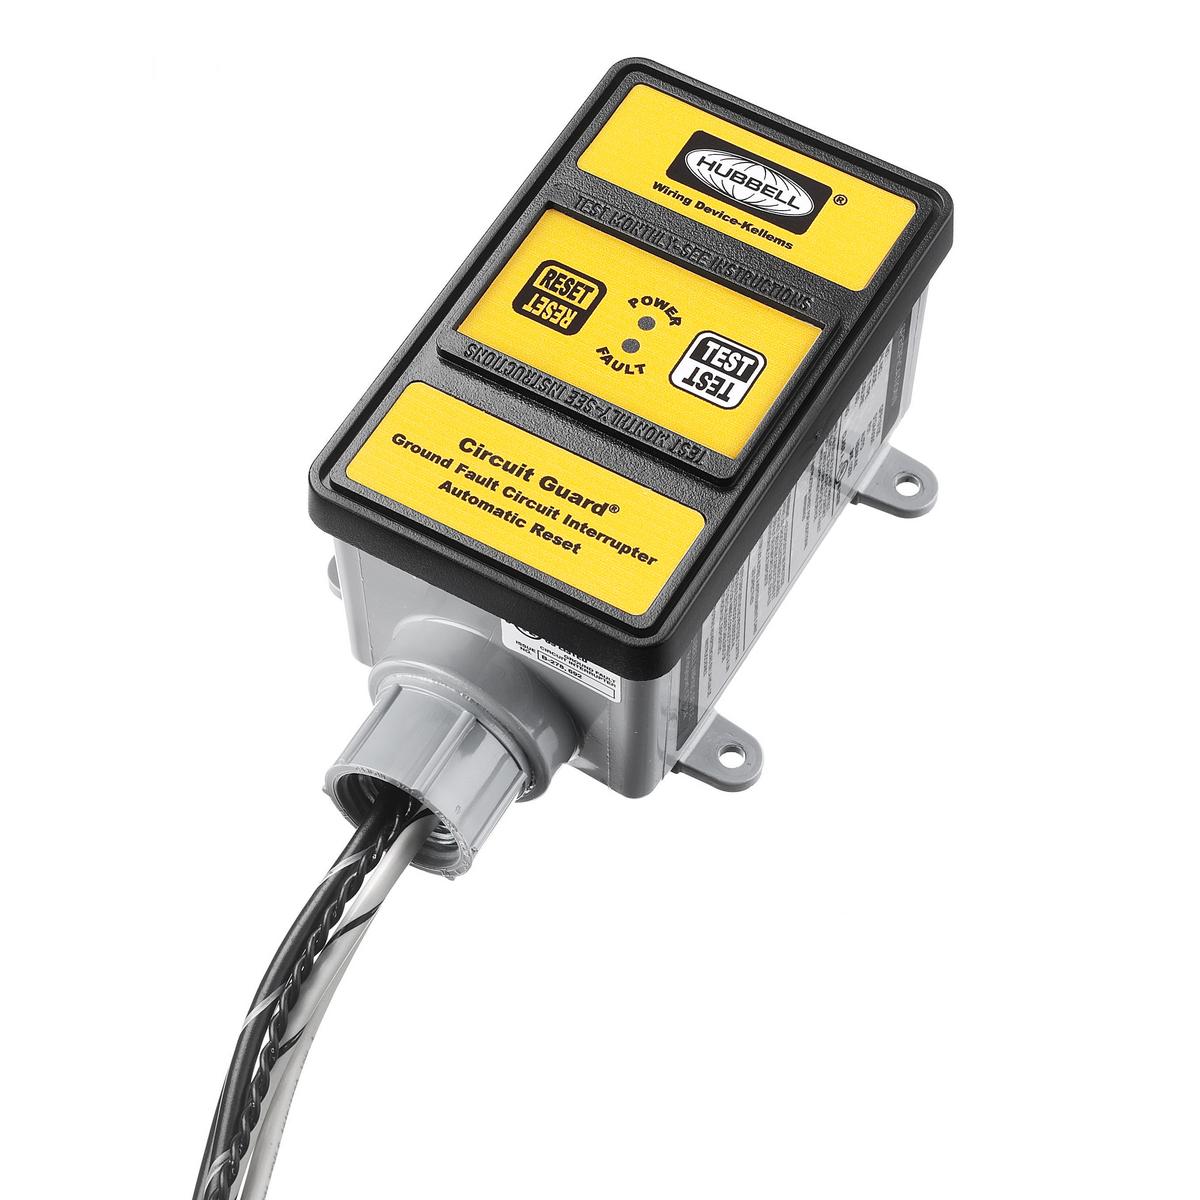 Gfhw13105 Brand Wiring Device Kellems Marine 120vac Wbp Prodimage